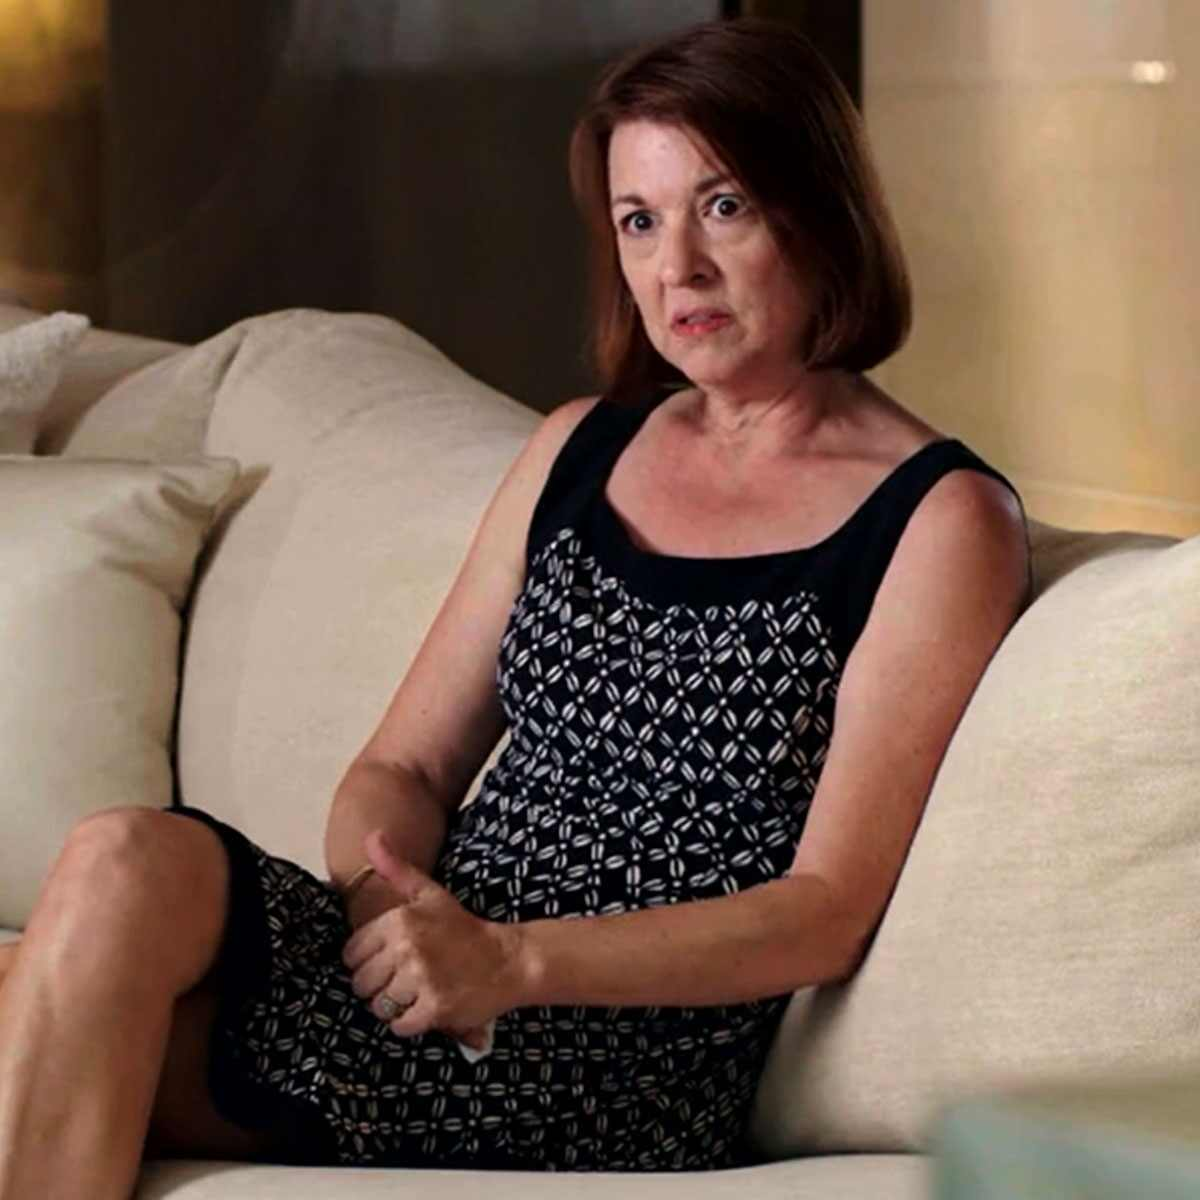 Colleen Beyer, The Widower, NBC